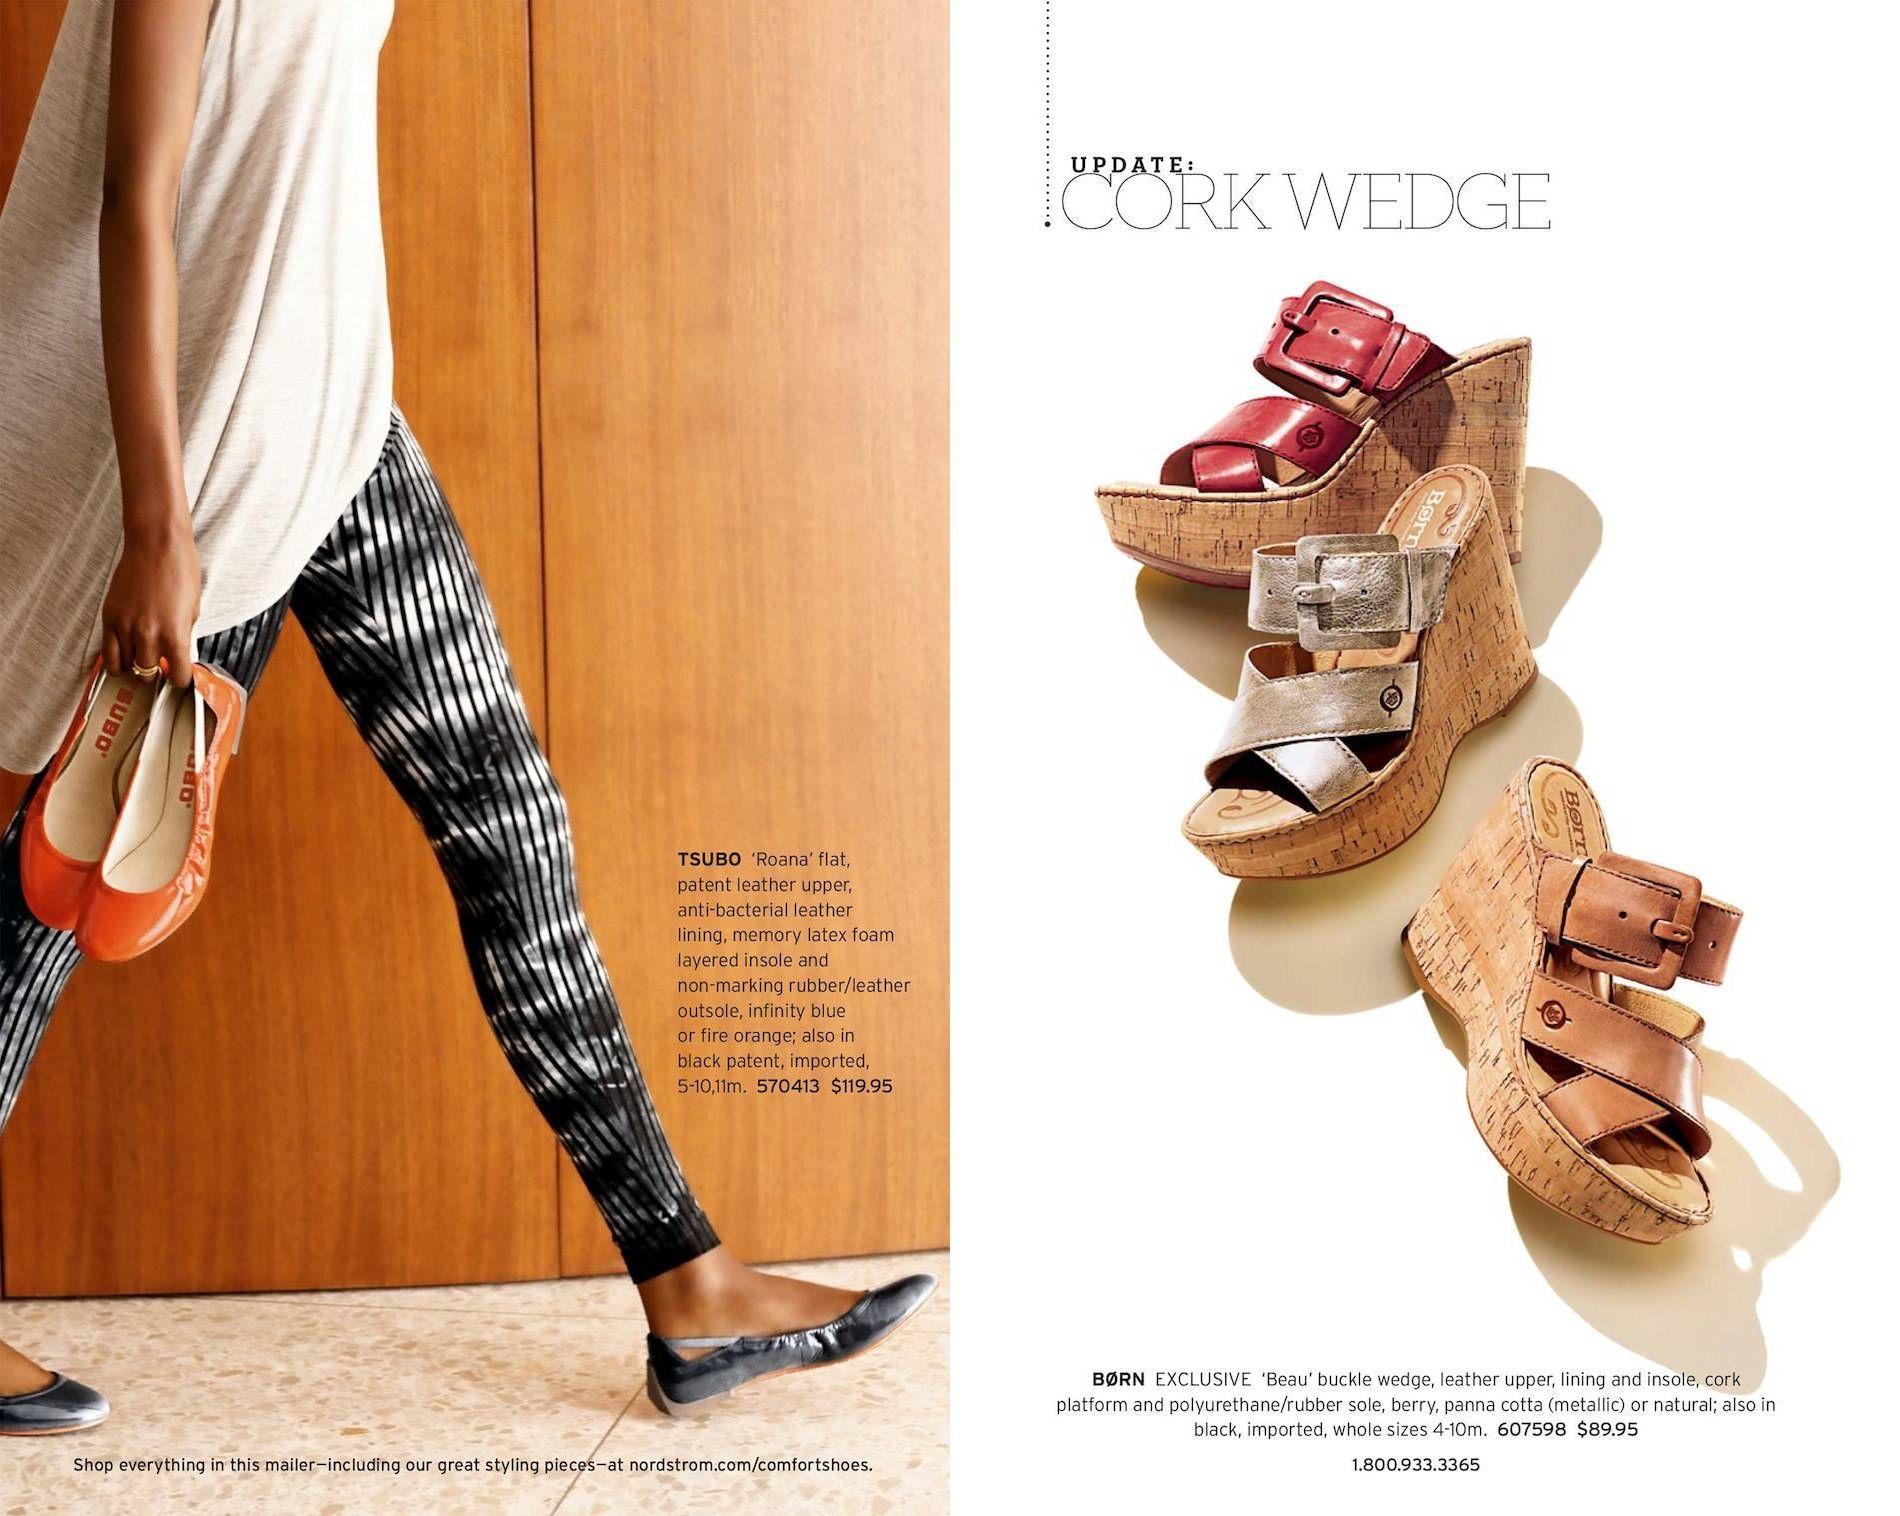 size 40 3a60c 324c1 Nordstrom April 2013 Comfort Shoes Catalog | BonTon in 2019 ...